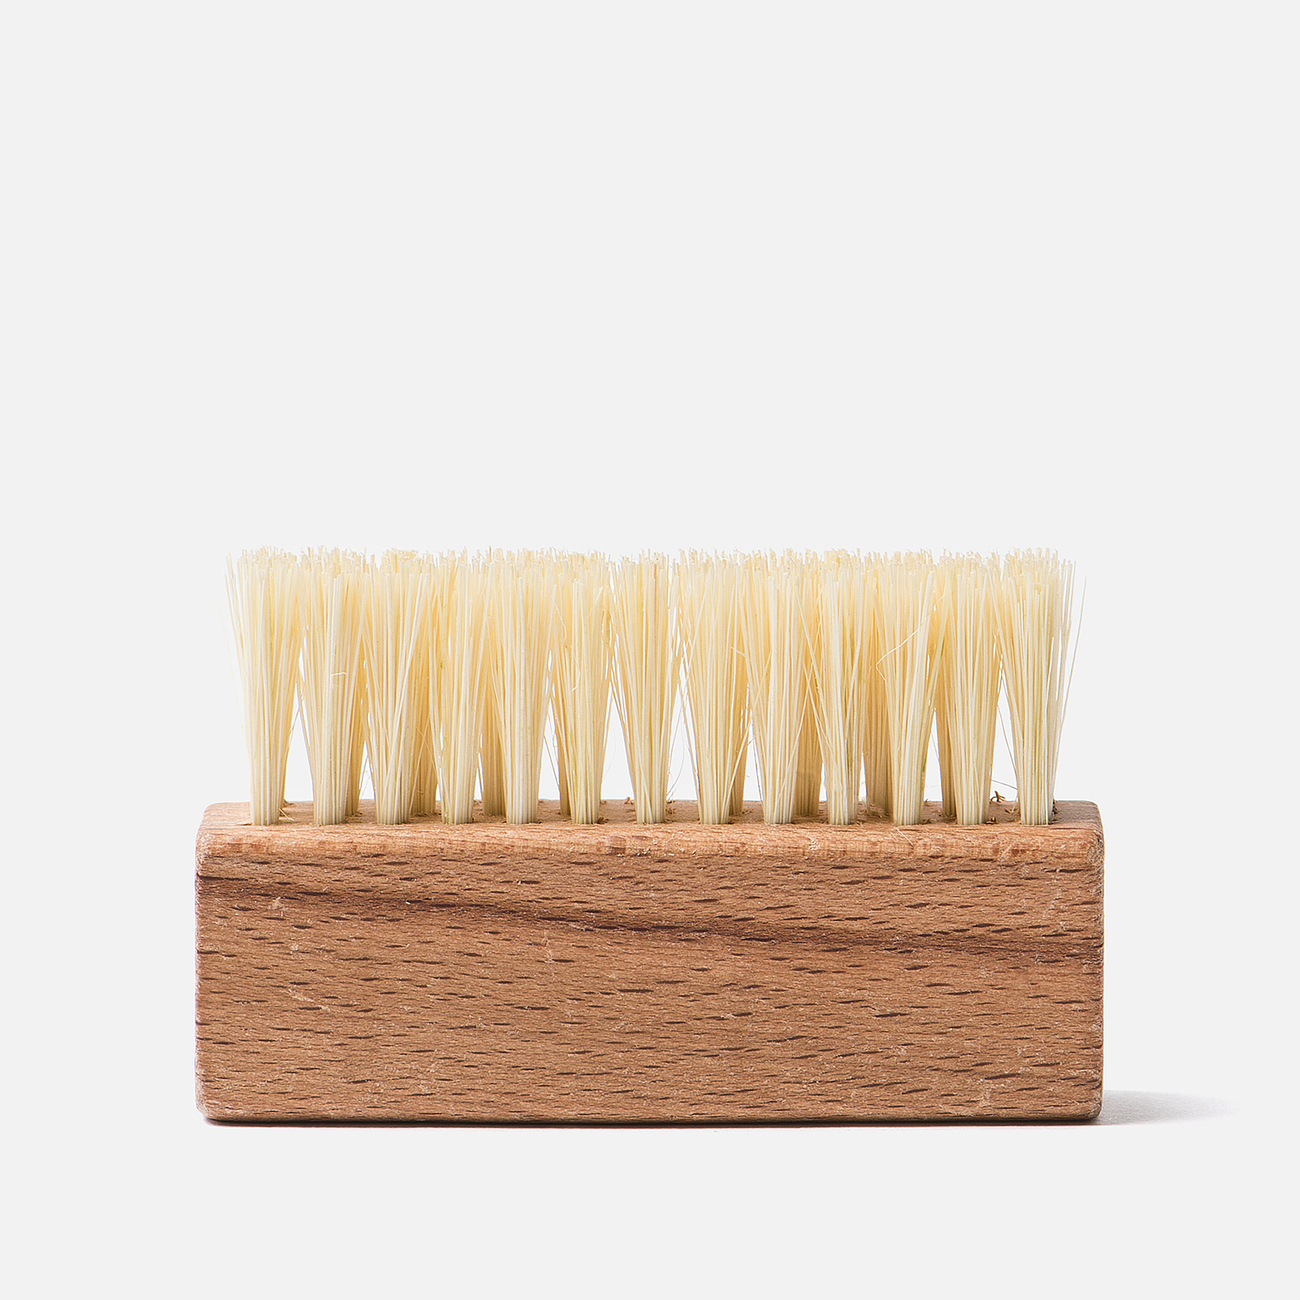 Щетка для обуви Tarrago Sneakers Care Midsole Brush